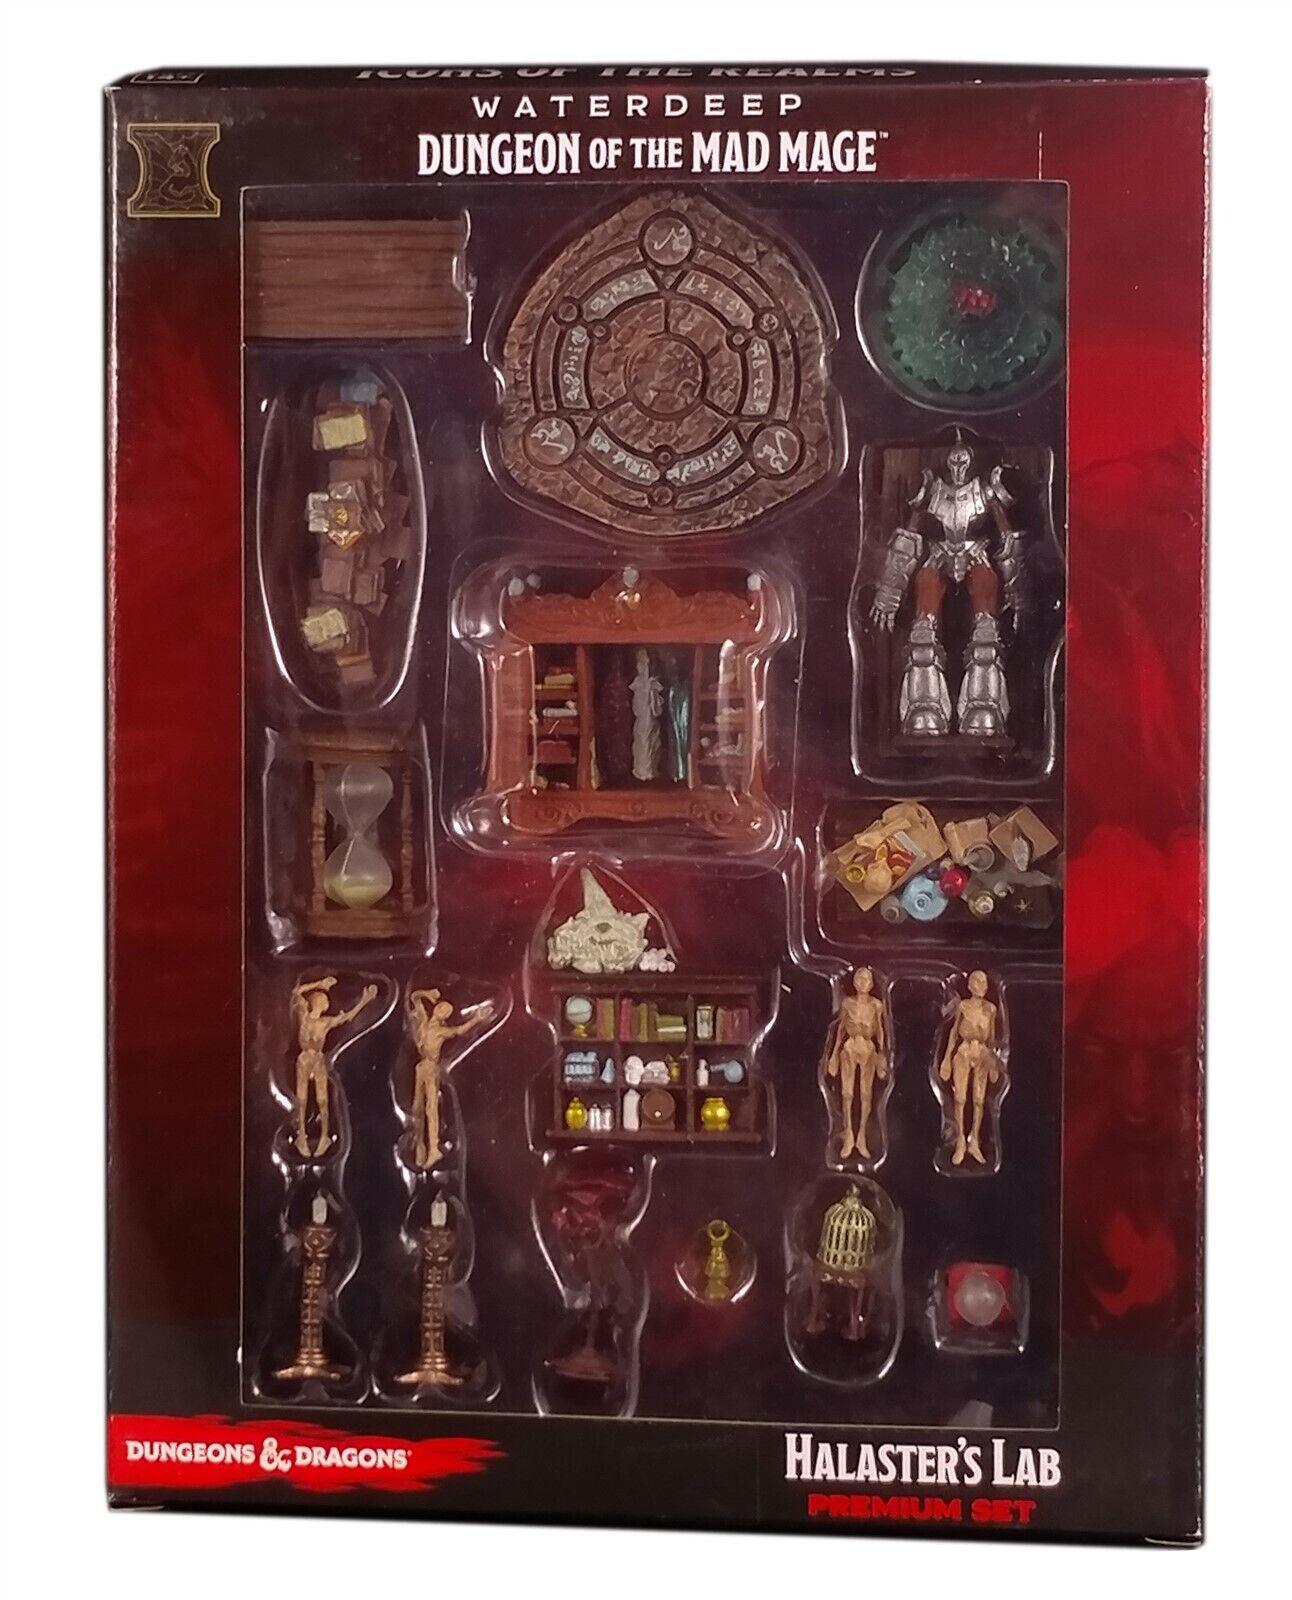 venta al por mayor barato Wizkids D&D Minis Minis Minis  Icons of the Realms Halaster's Lab Premium Set, New  nuevo sádico